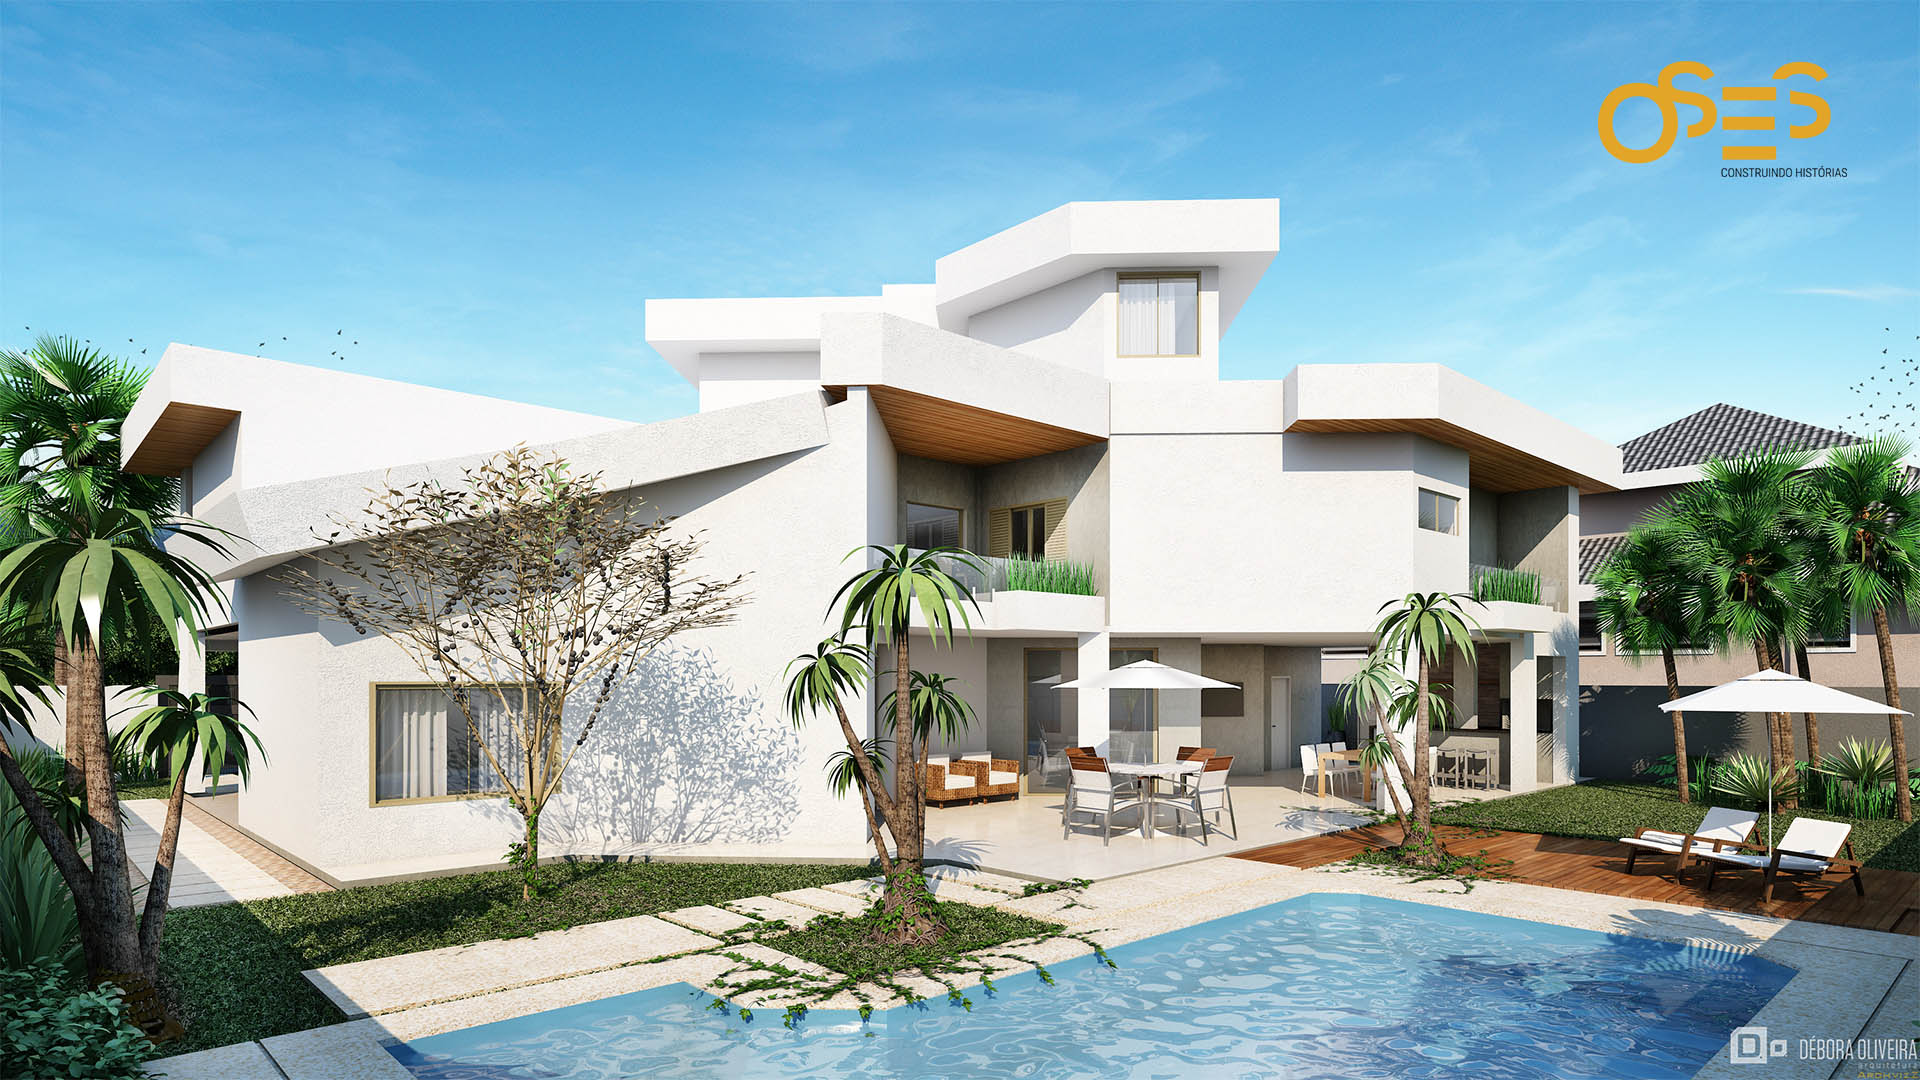 oses-construtora-casa-angular (1)